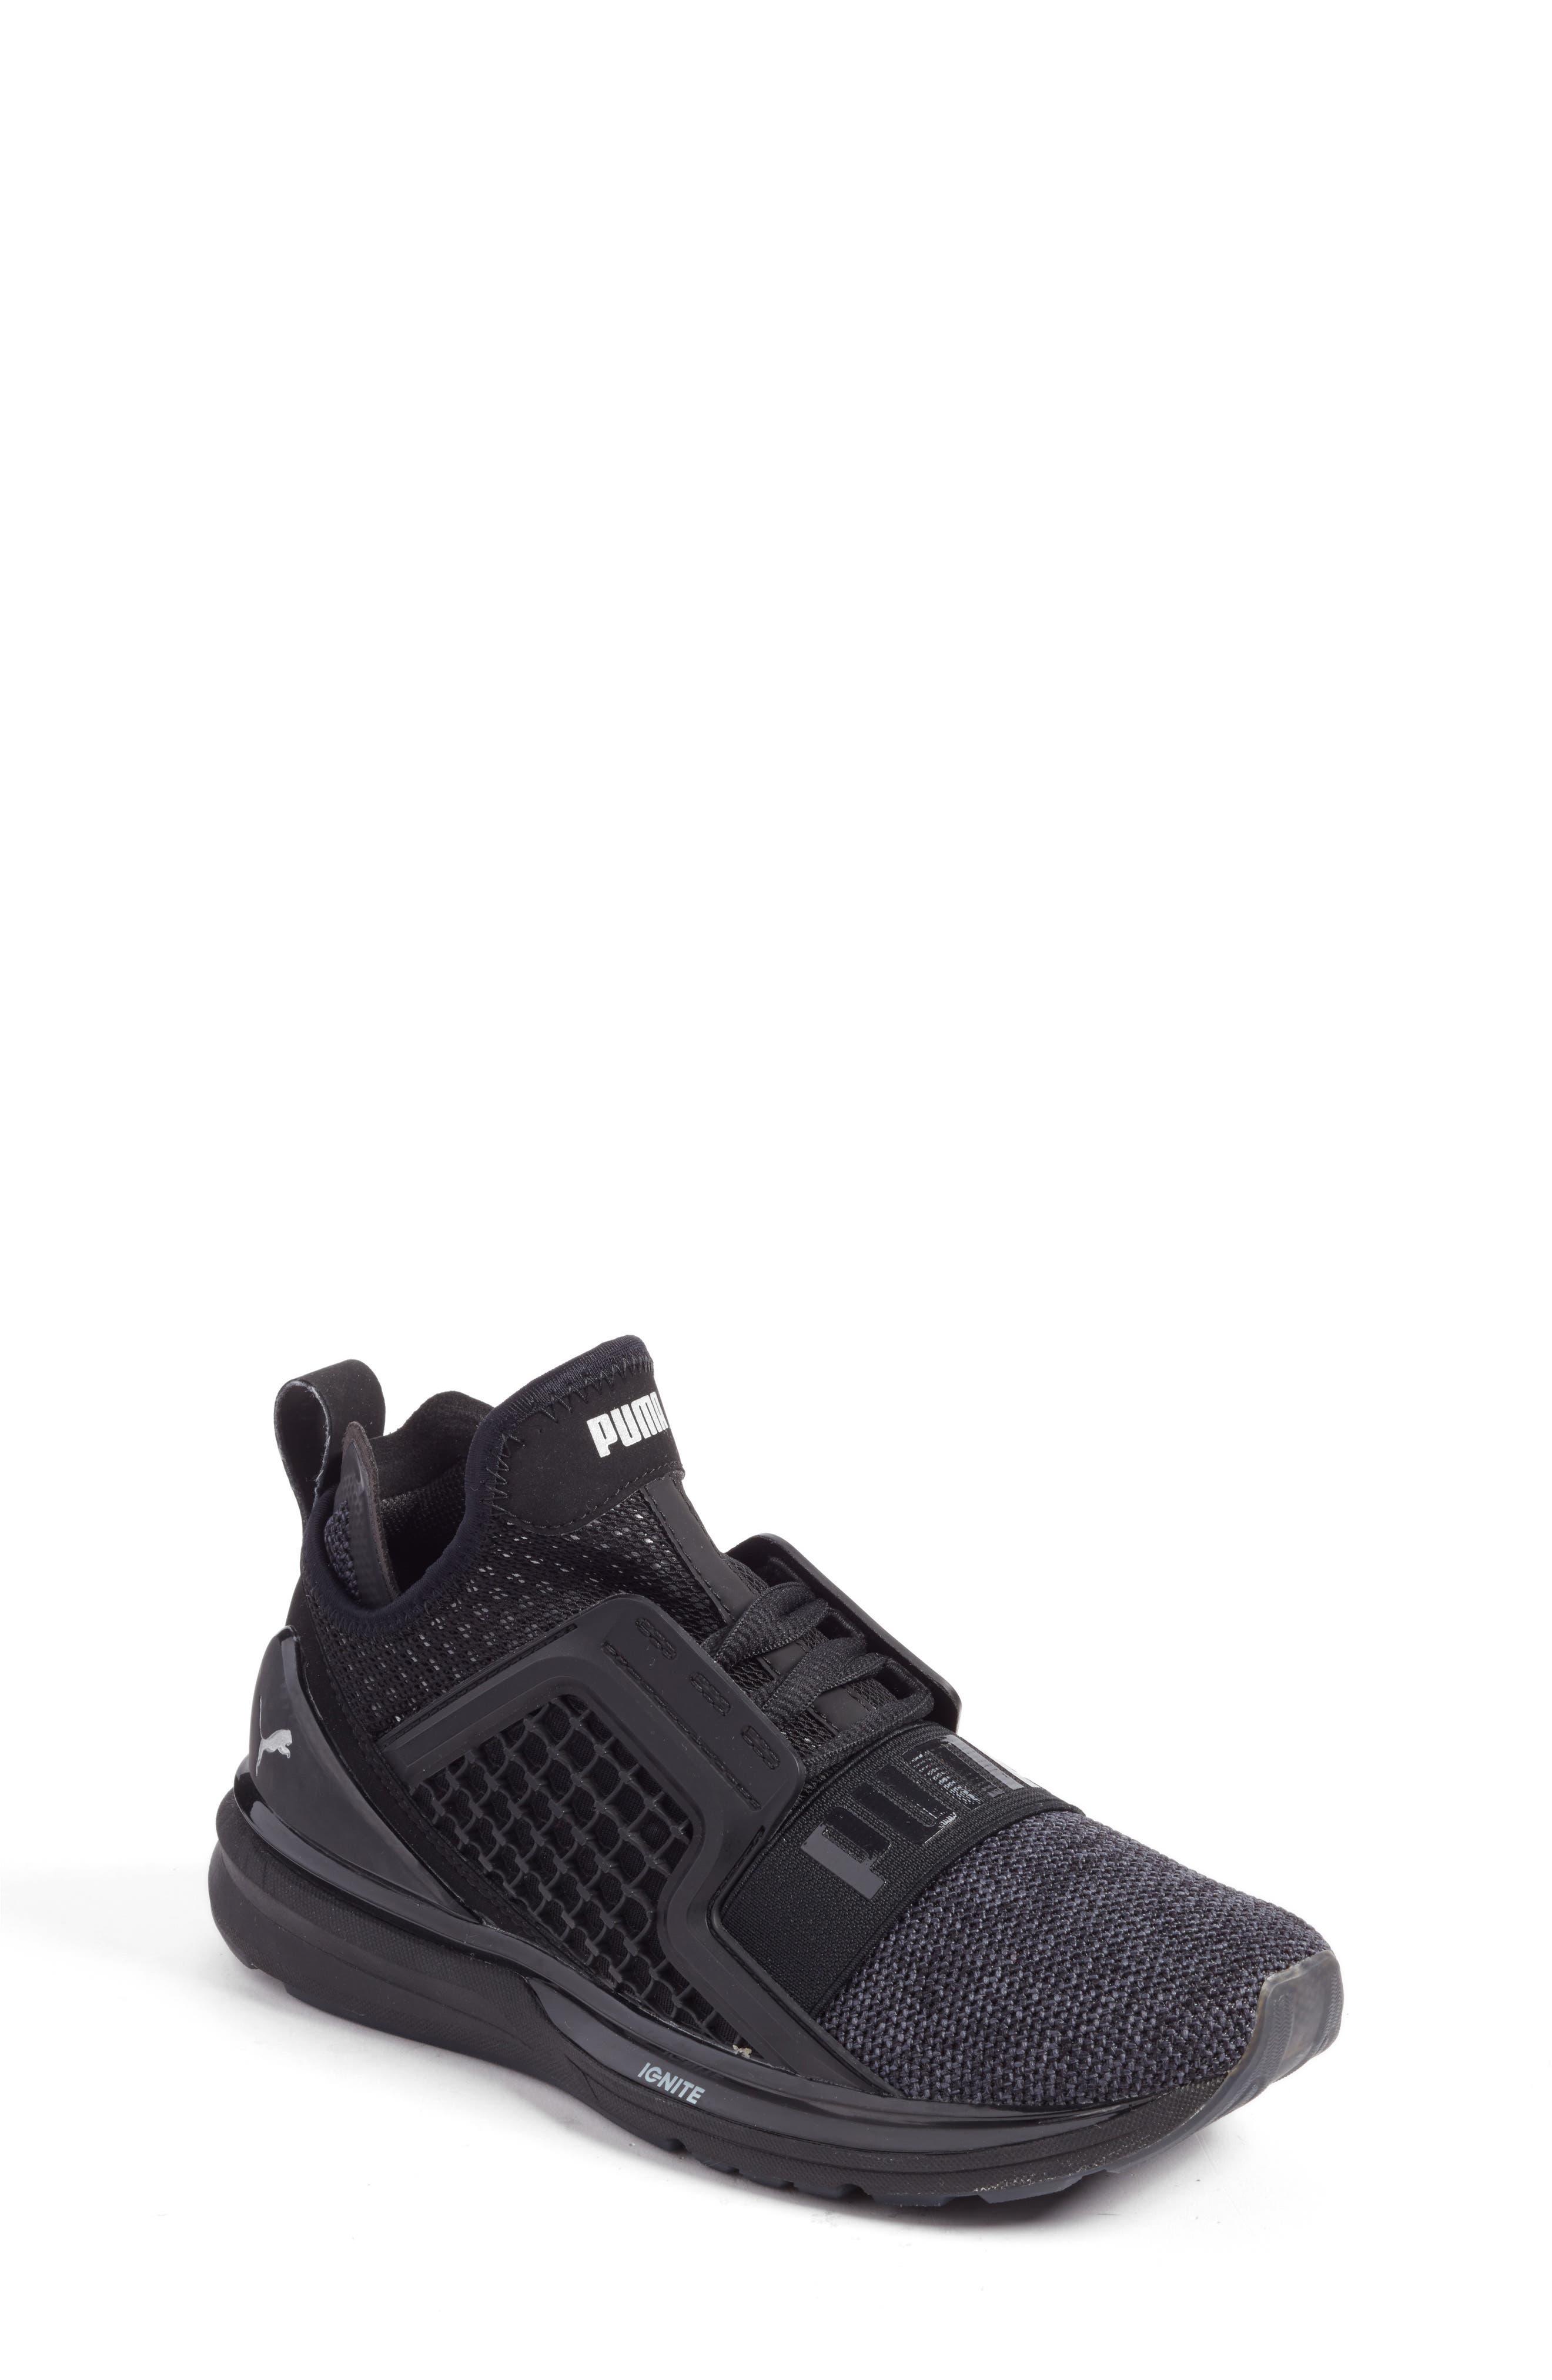 PUMA Ignite Limitless Sneaker